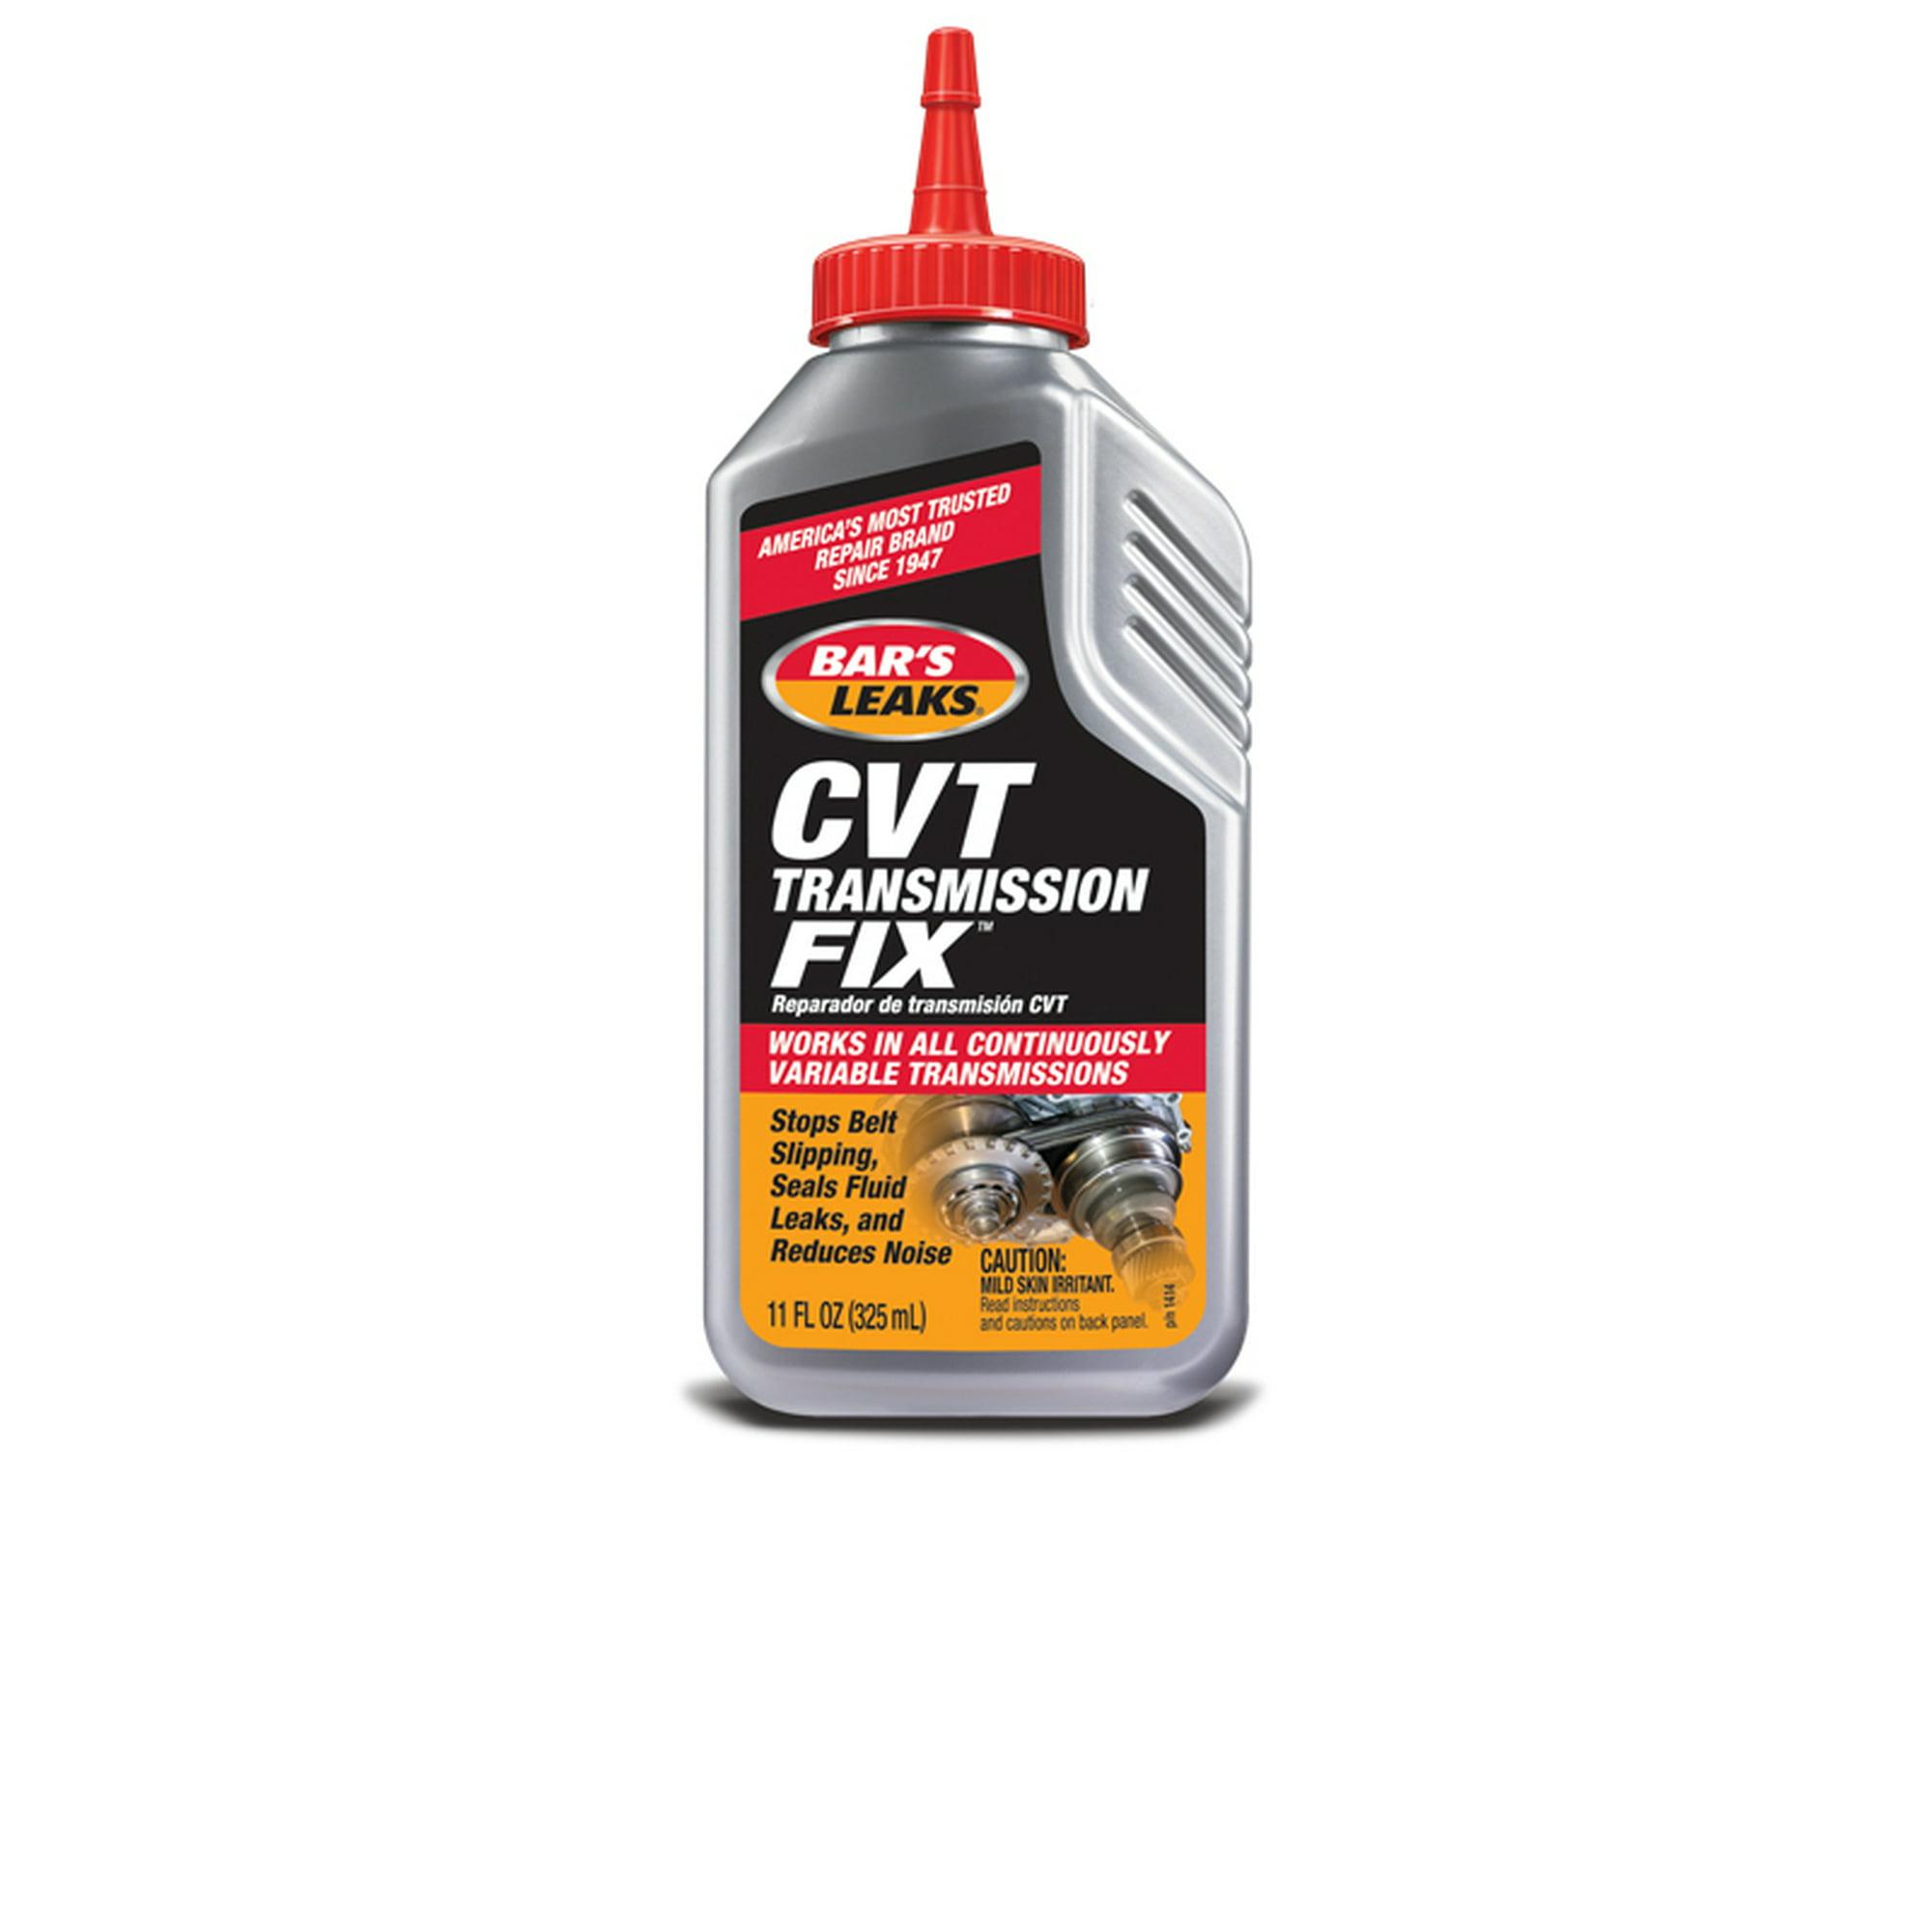 Bar's Products 1414 Auto Trans Stop Leak Transmission Fix